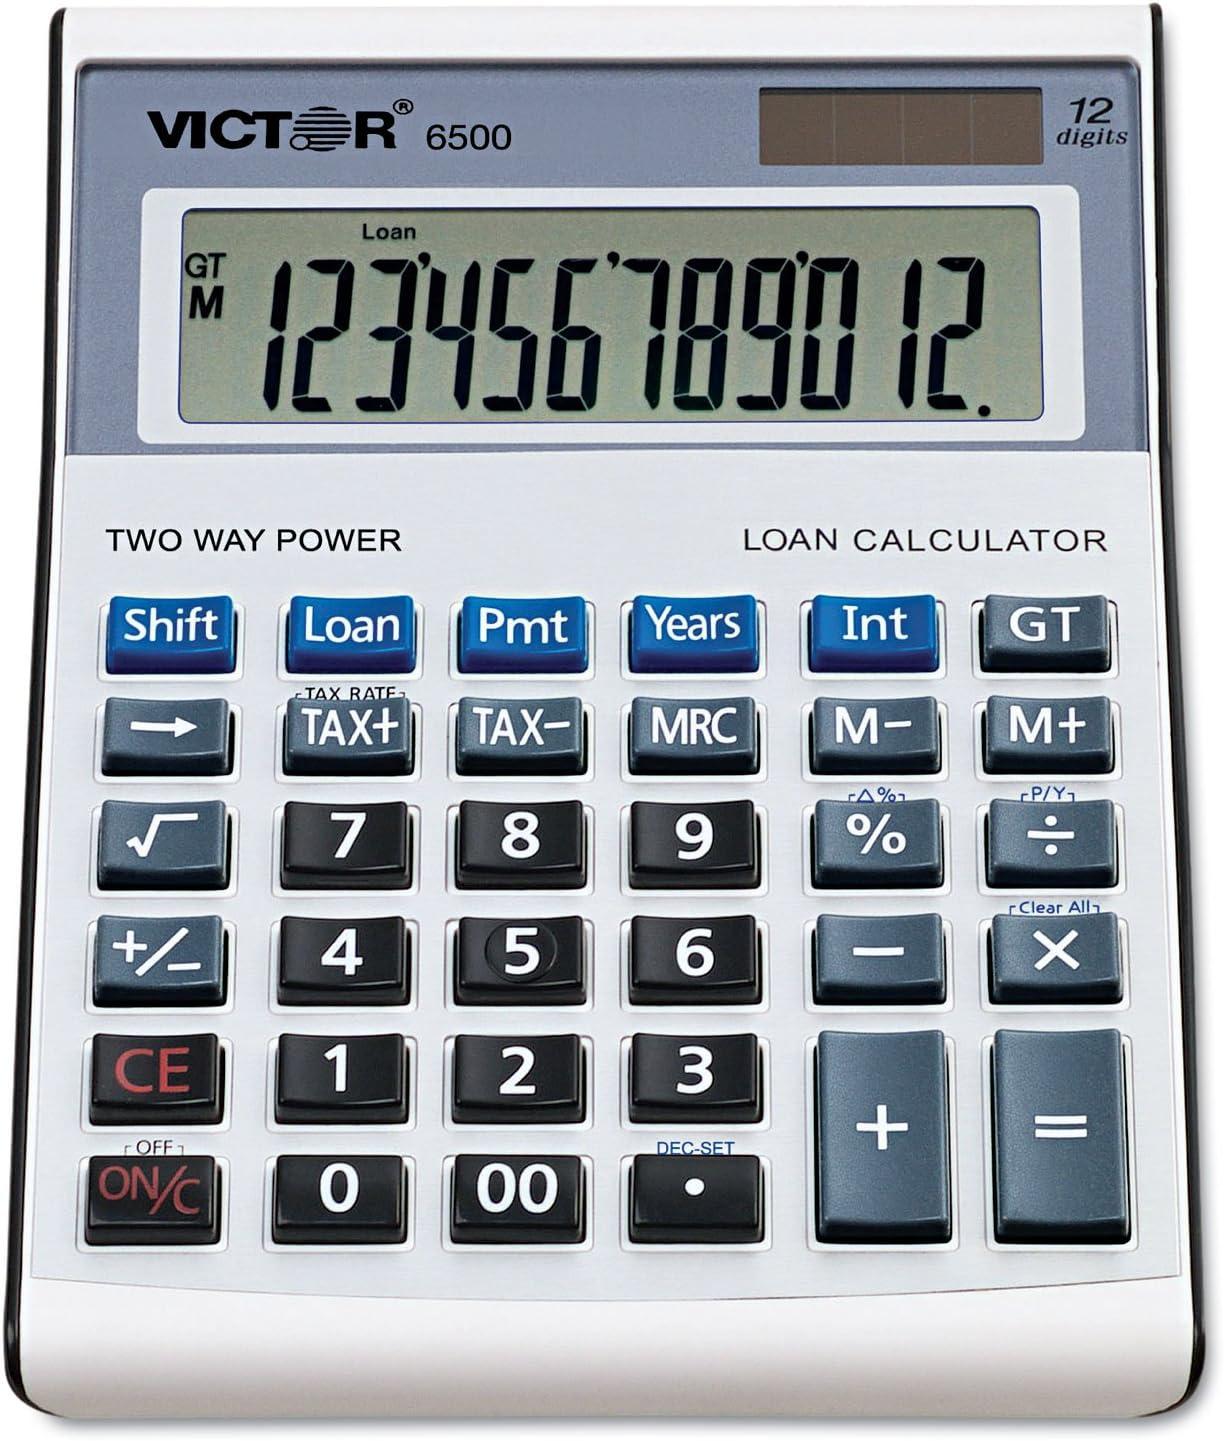 Best mortgage calculator 2020